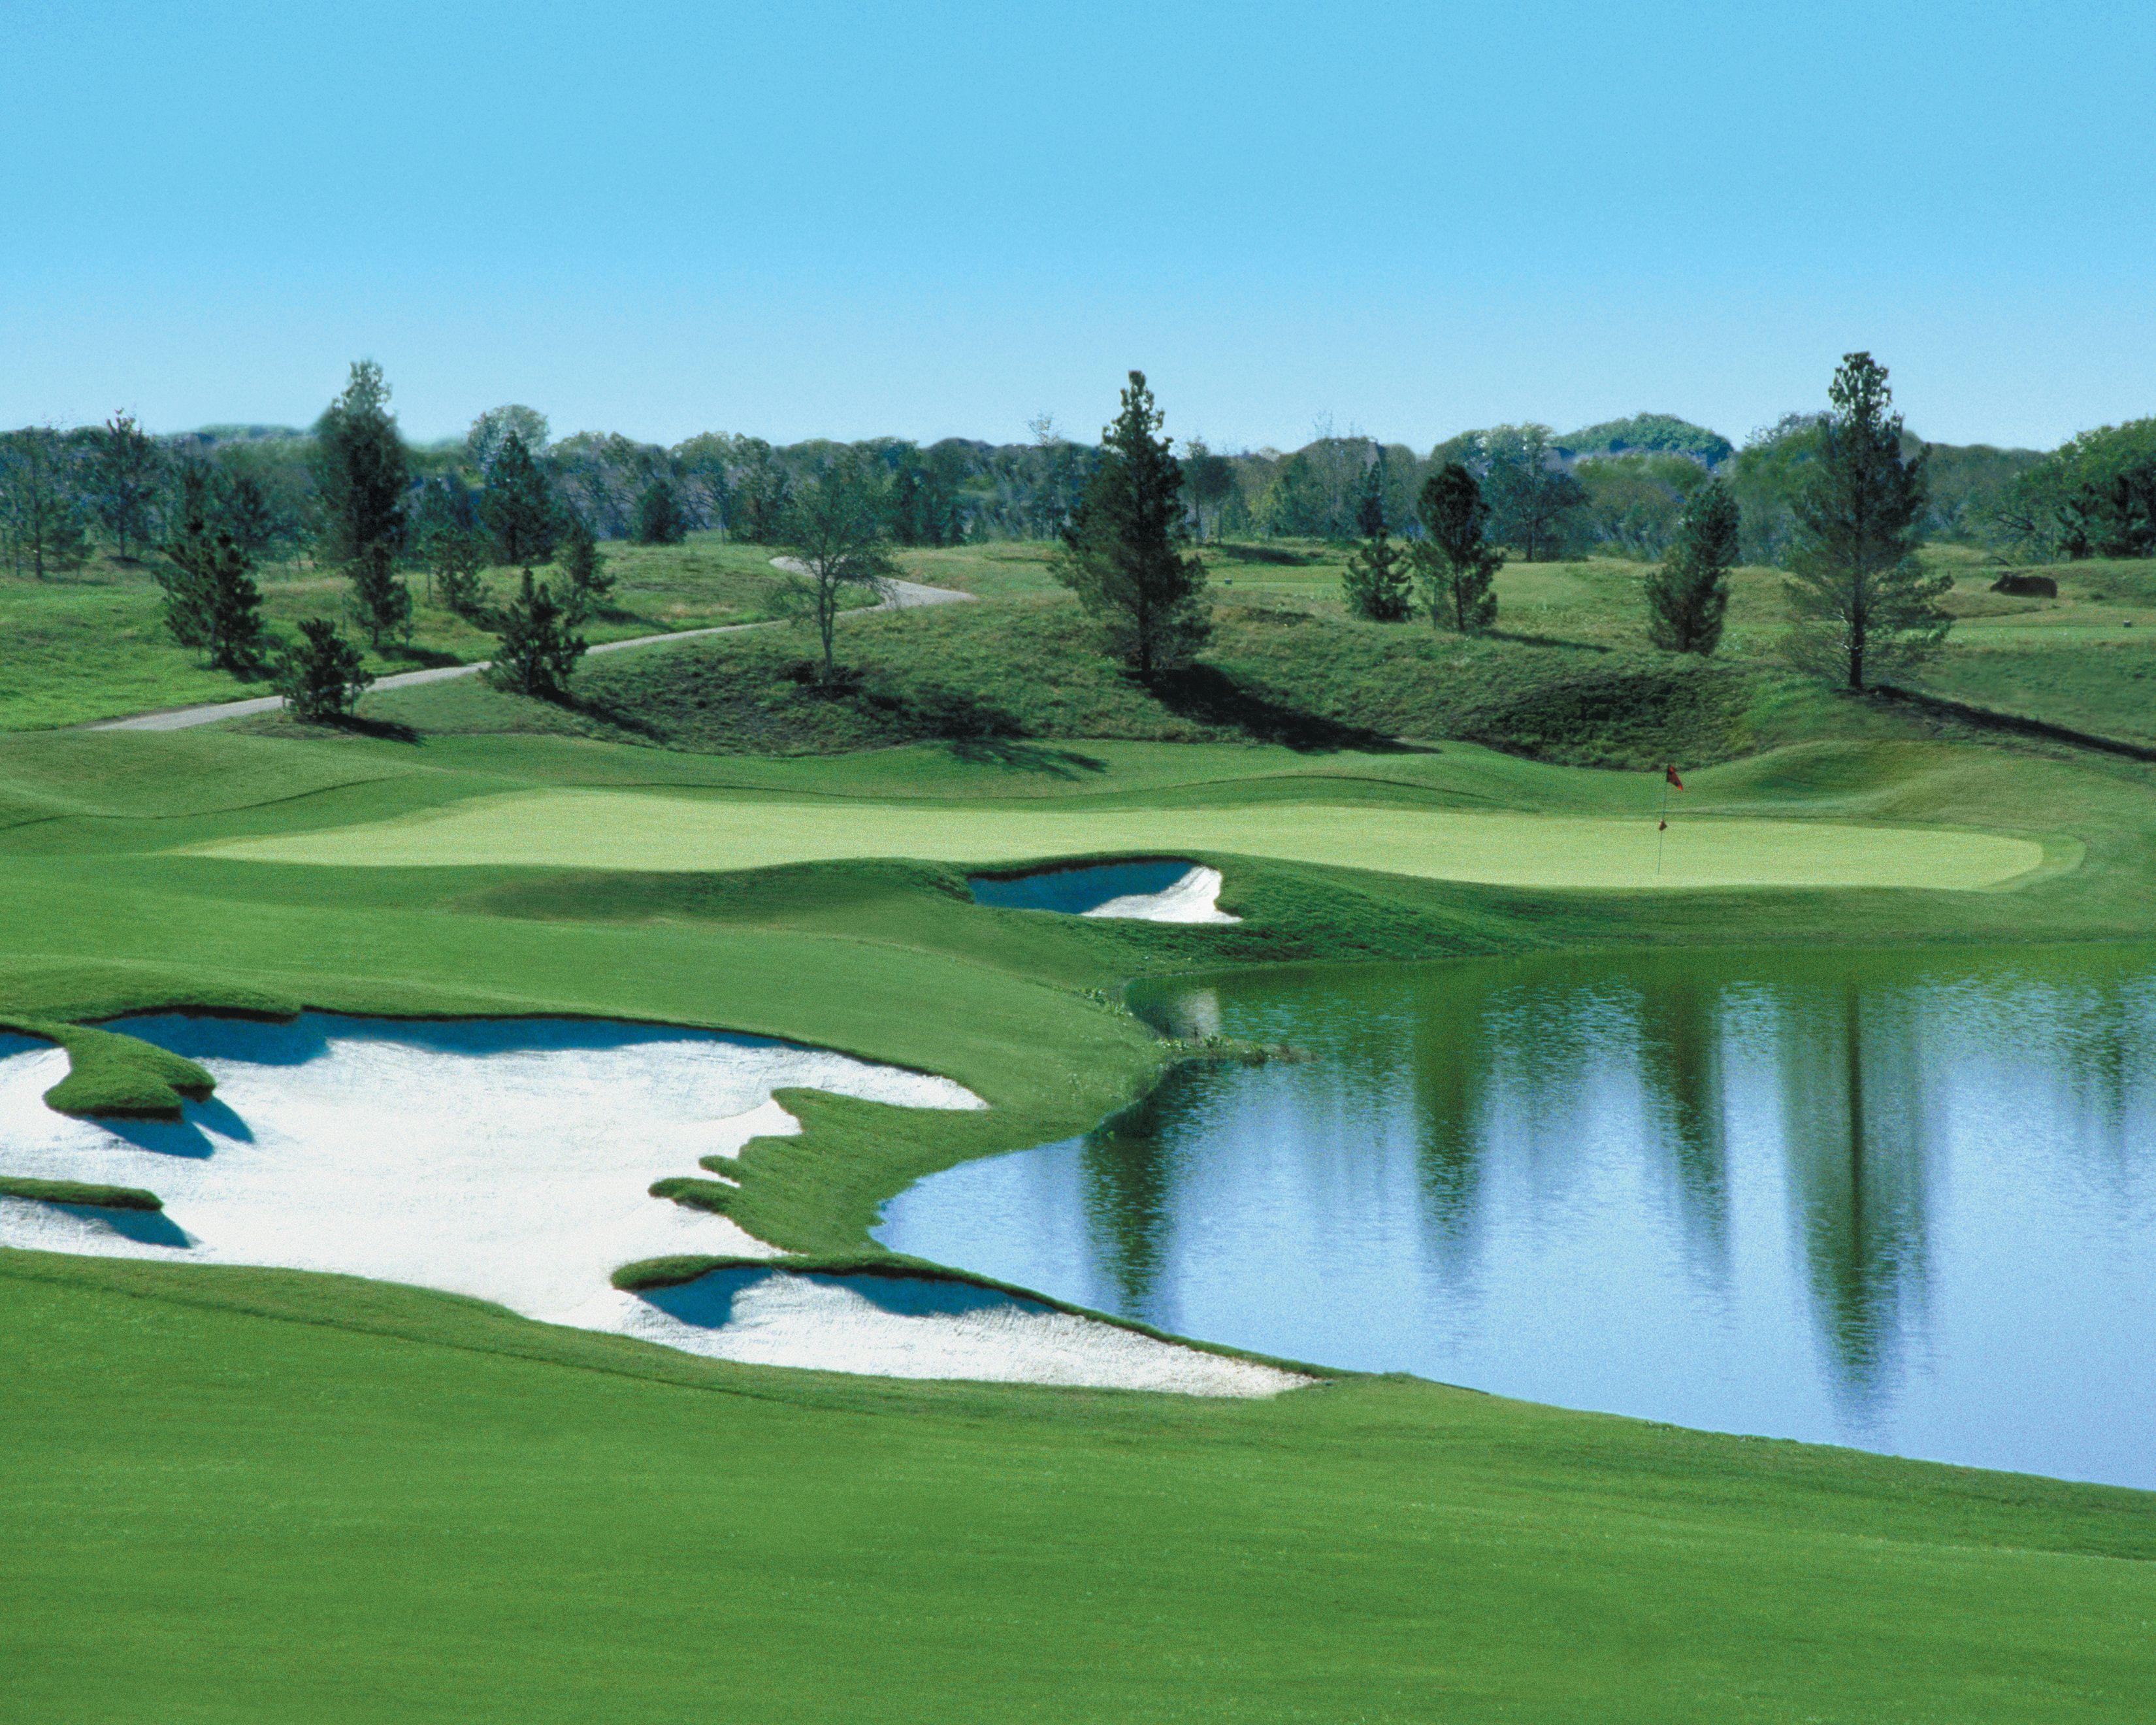 10+ 9 hole golf course dallas tx ideas in 2021